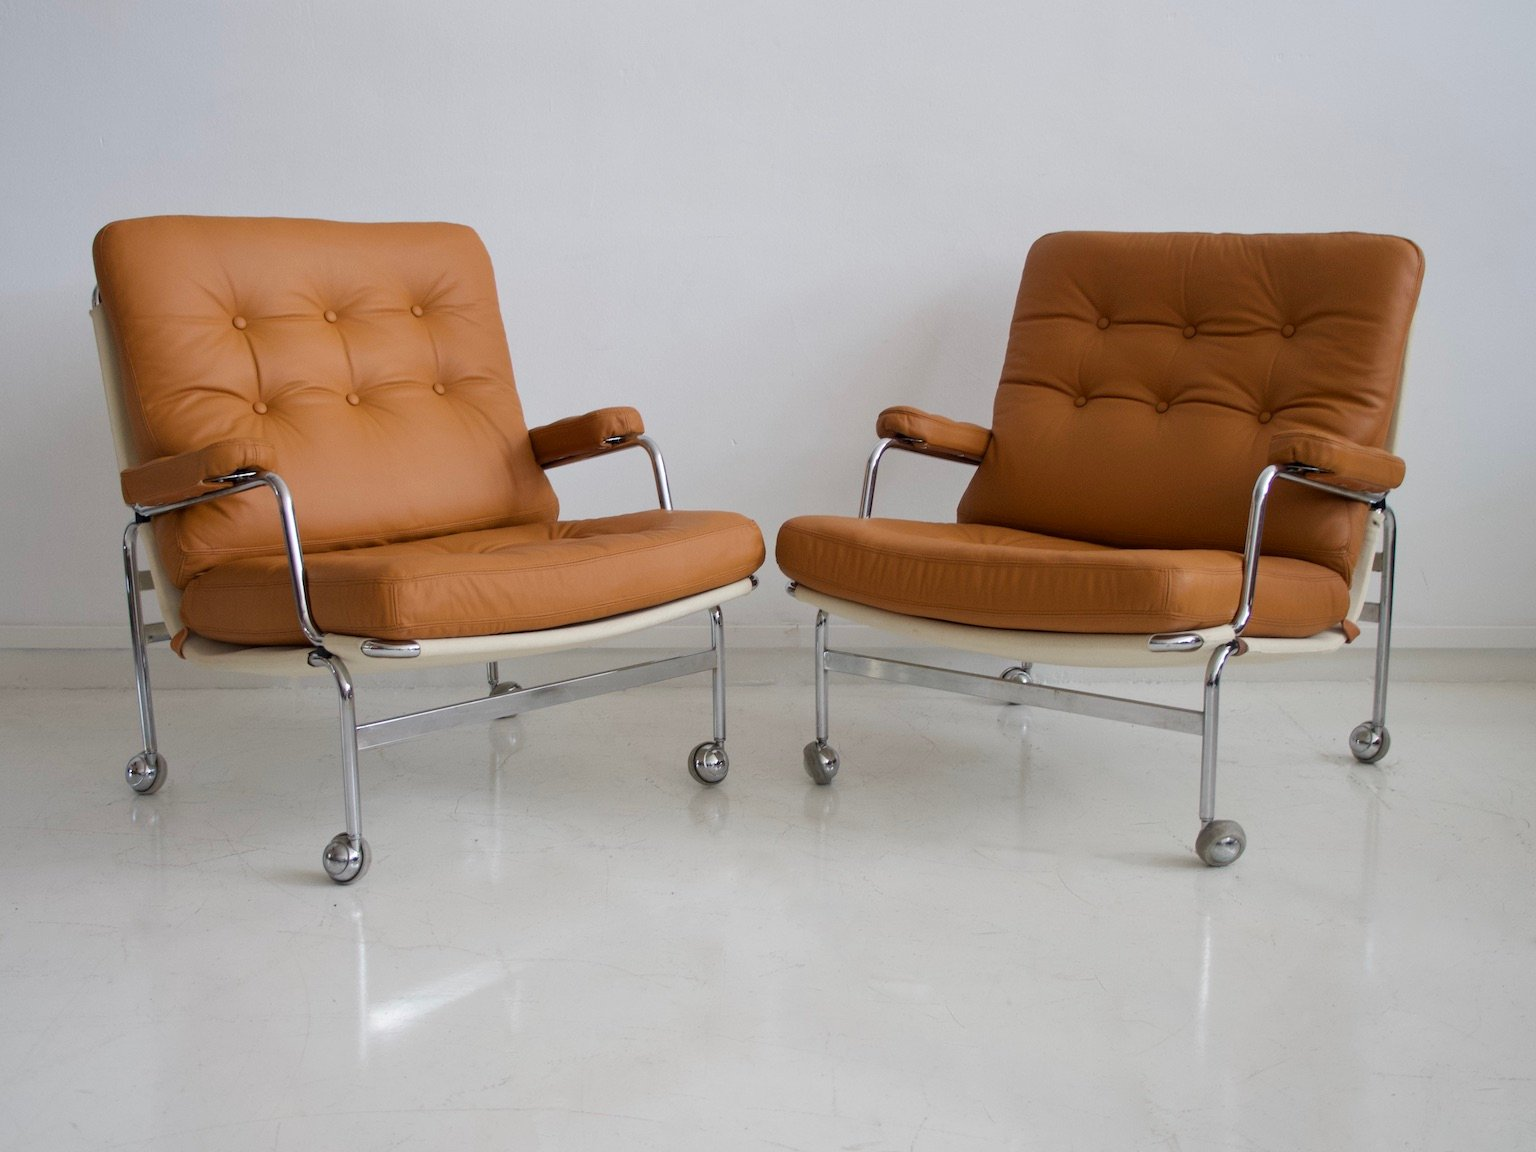 2er SET 60er Jahre Stuhl Lehnstuhl mit Armlehnen Easy chair Sessel mad men style